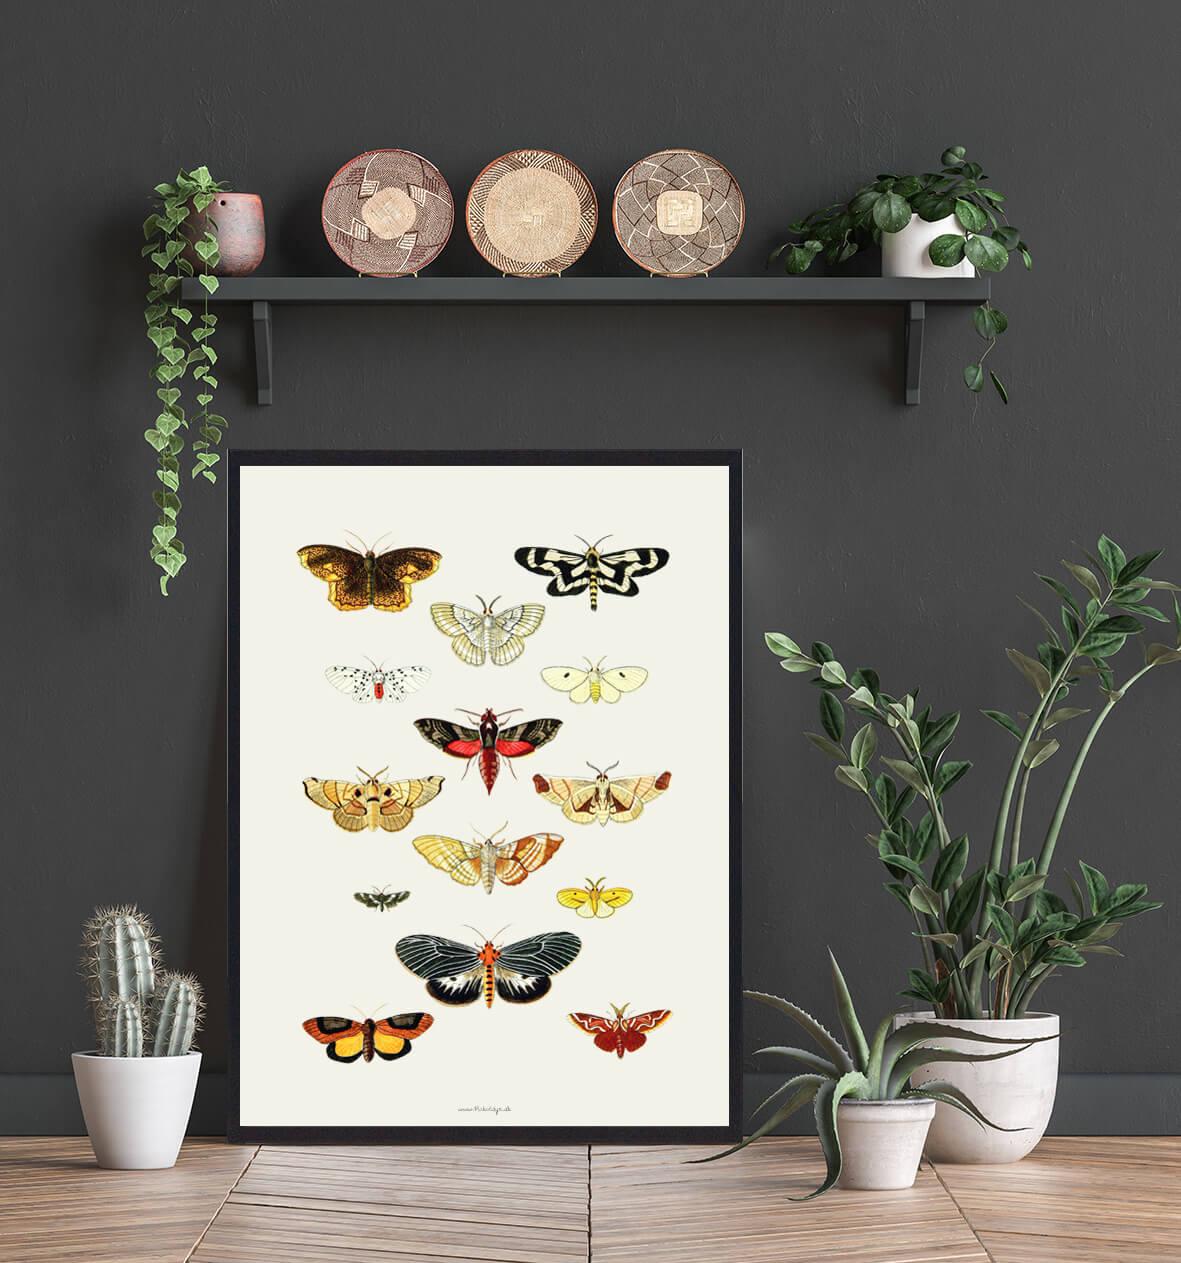 sommerfugle-plakater-koeb-3